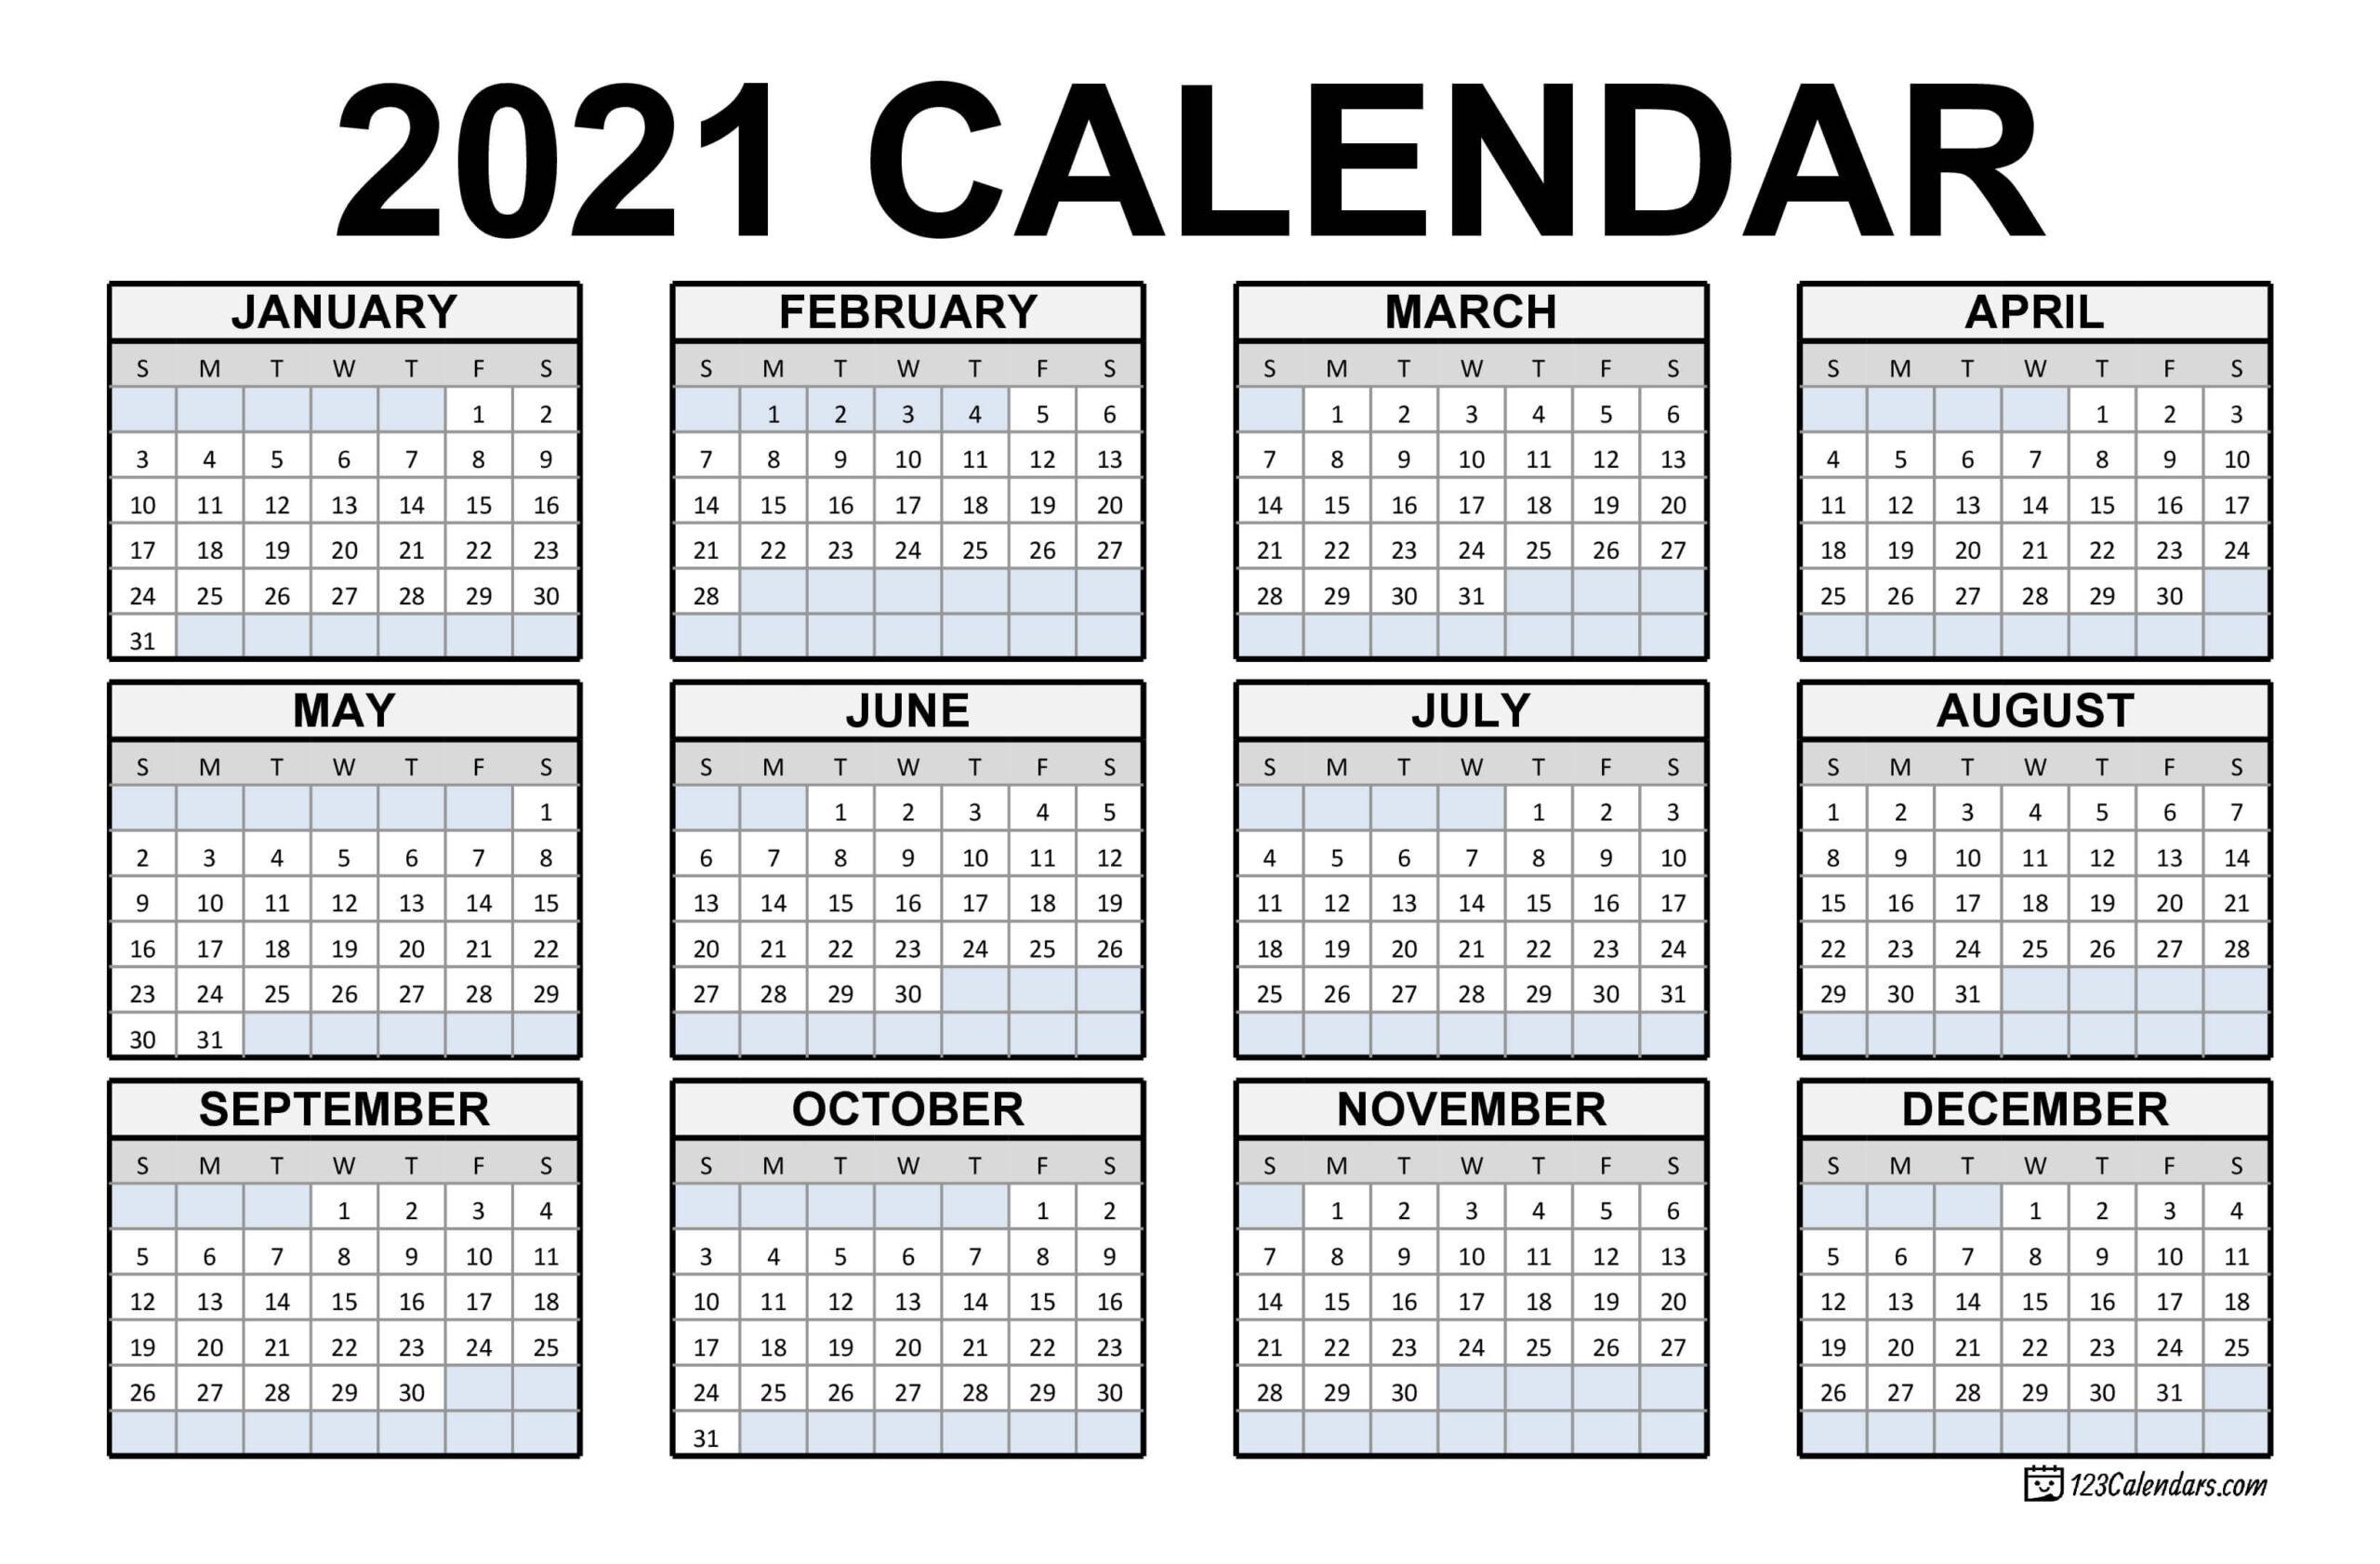 2021 Printable Calendar | 123Calendars inside Pocket Calendar Printable 2021